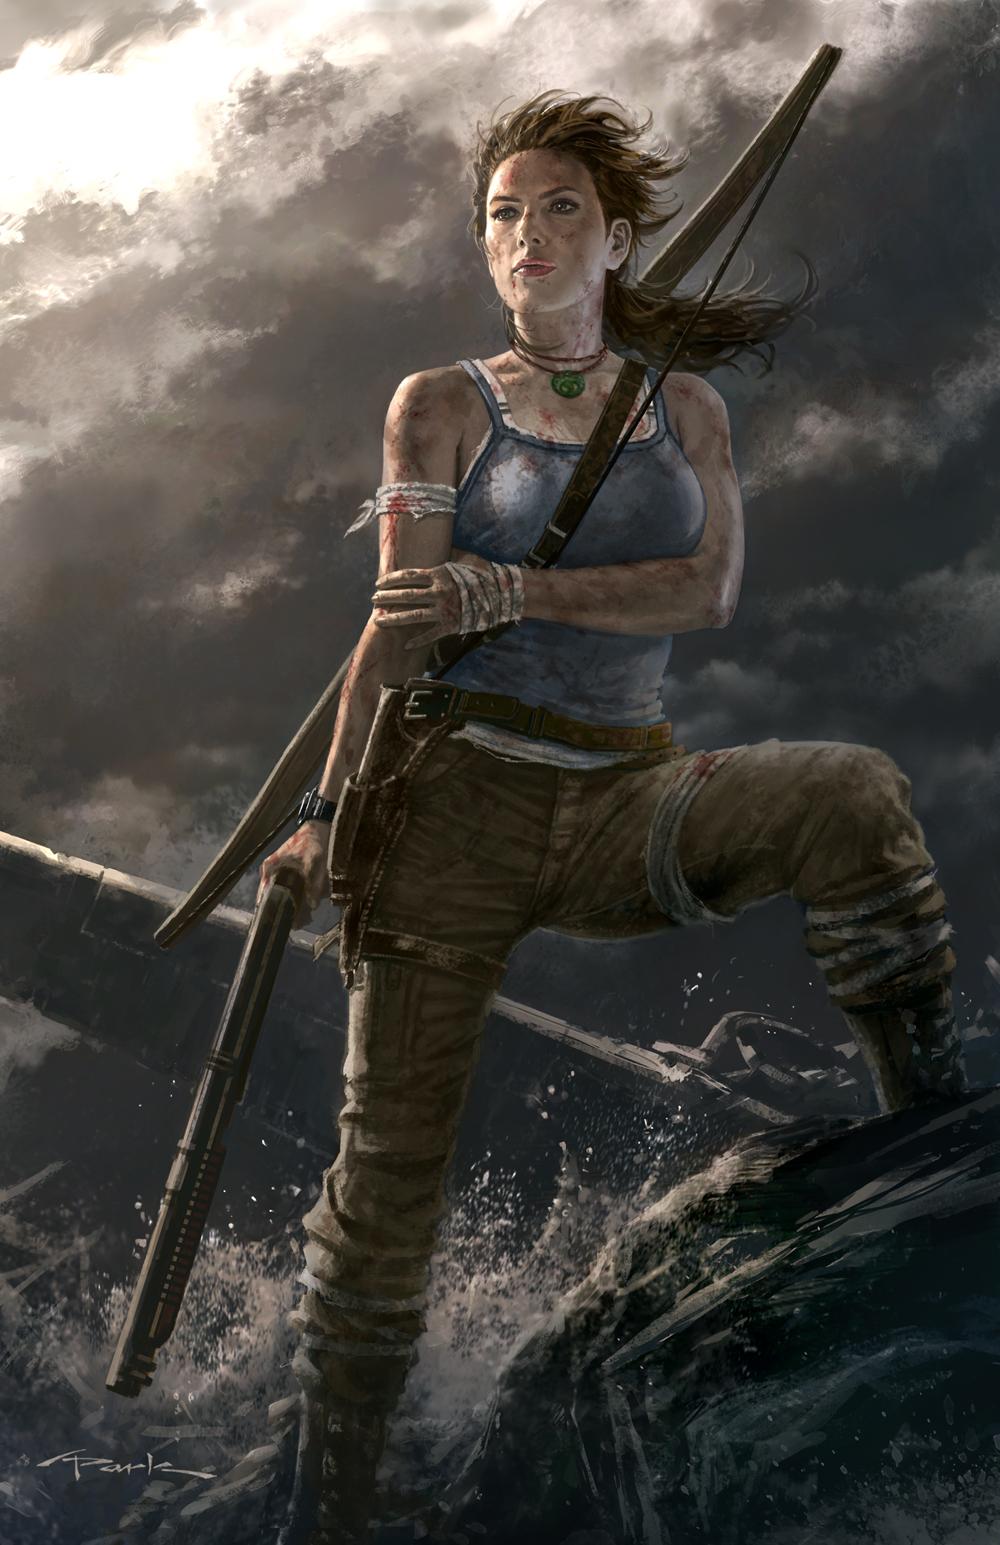 Lara Croft Concept Art